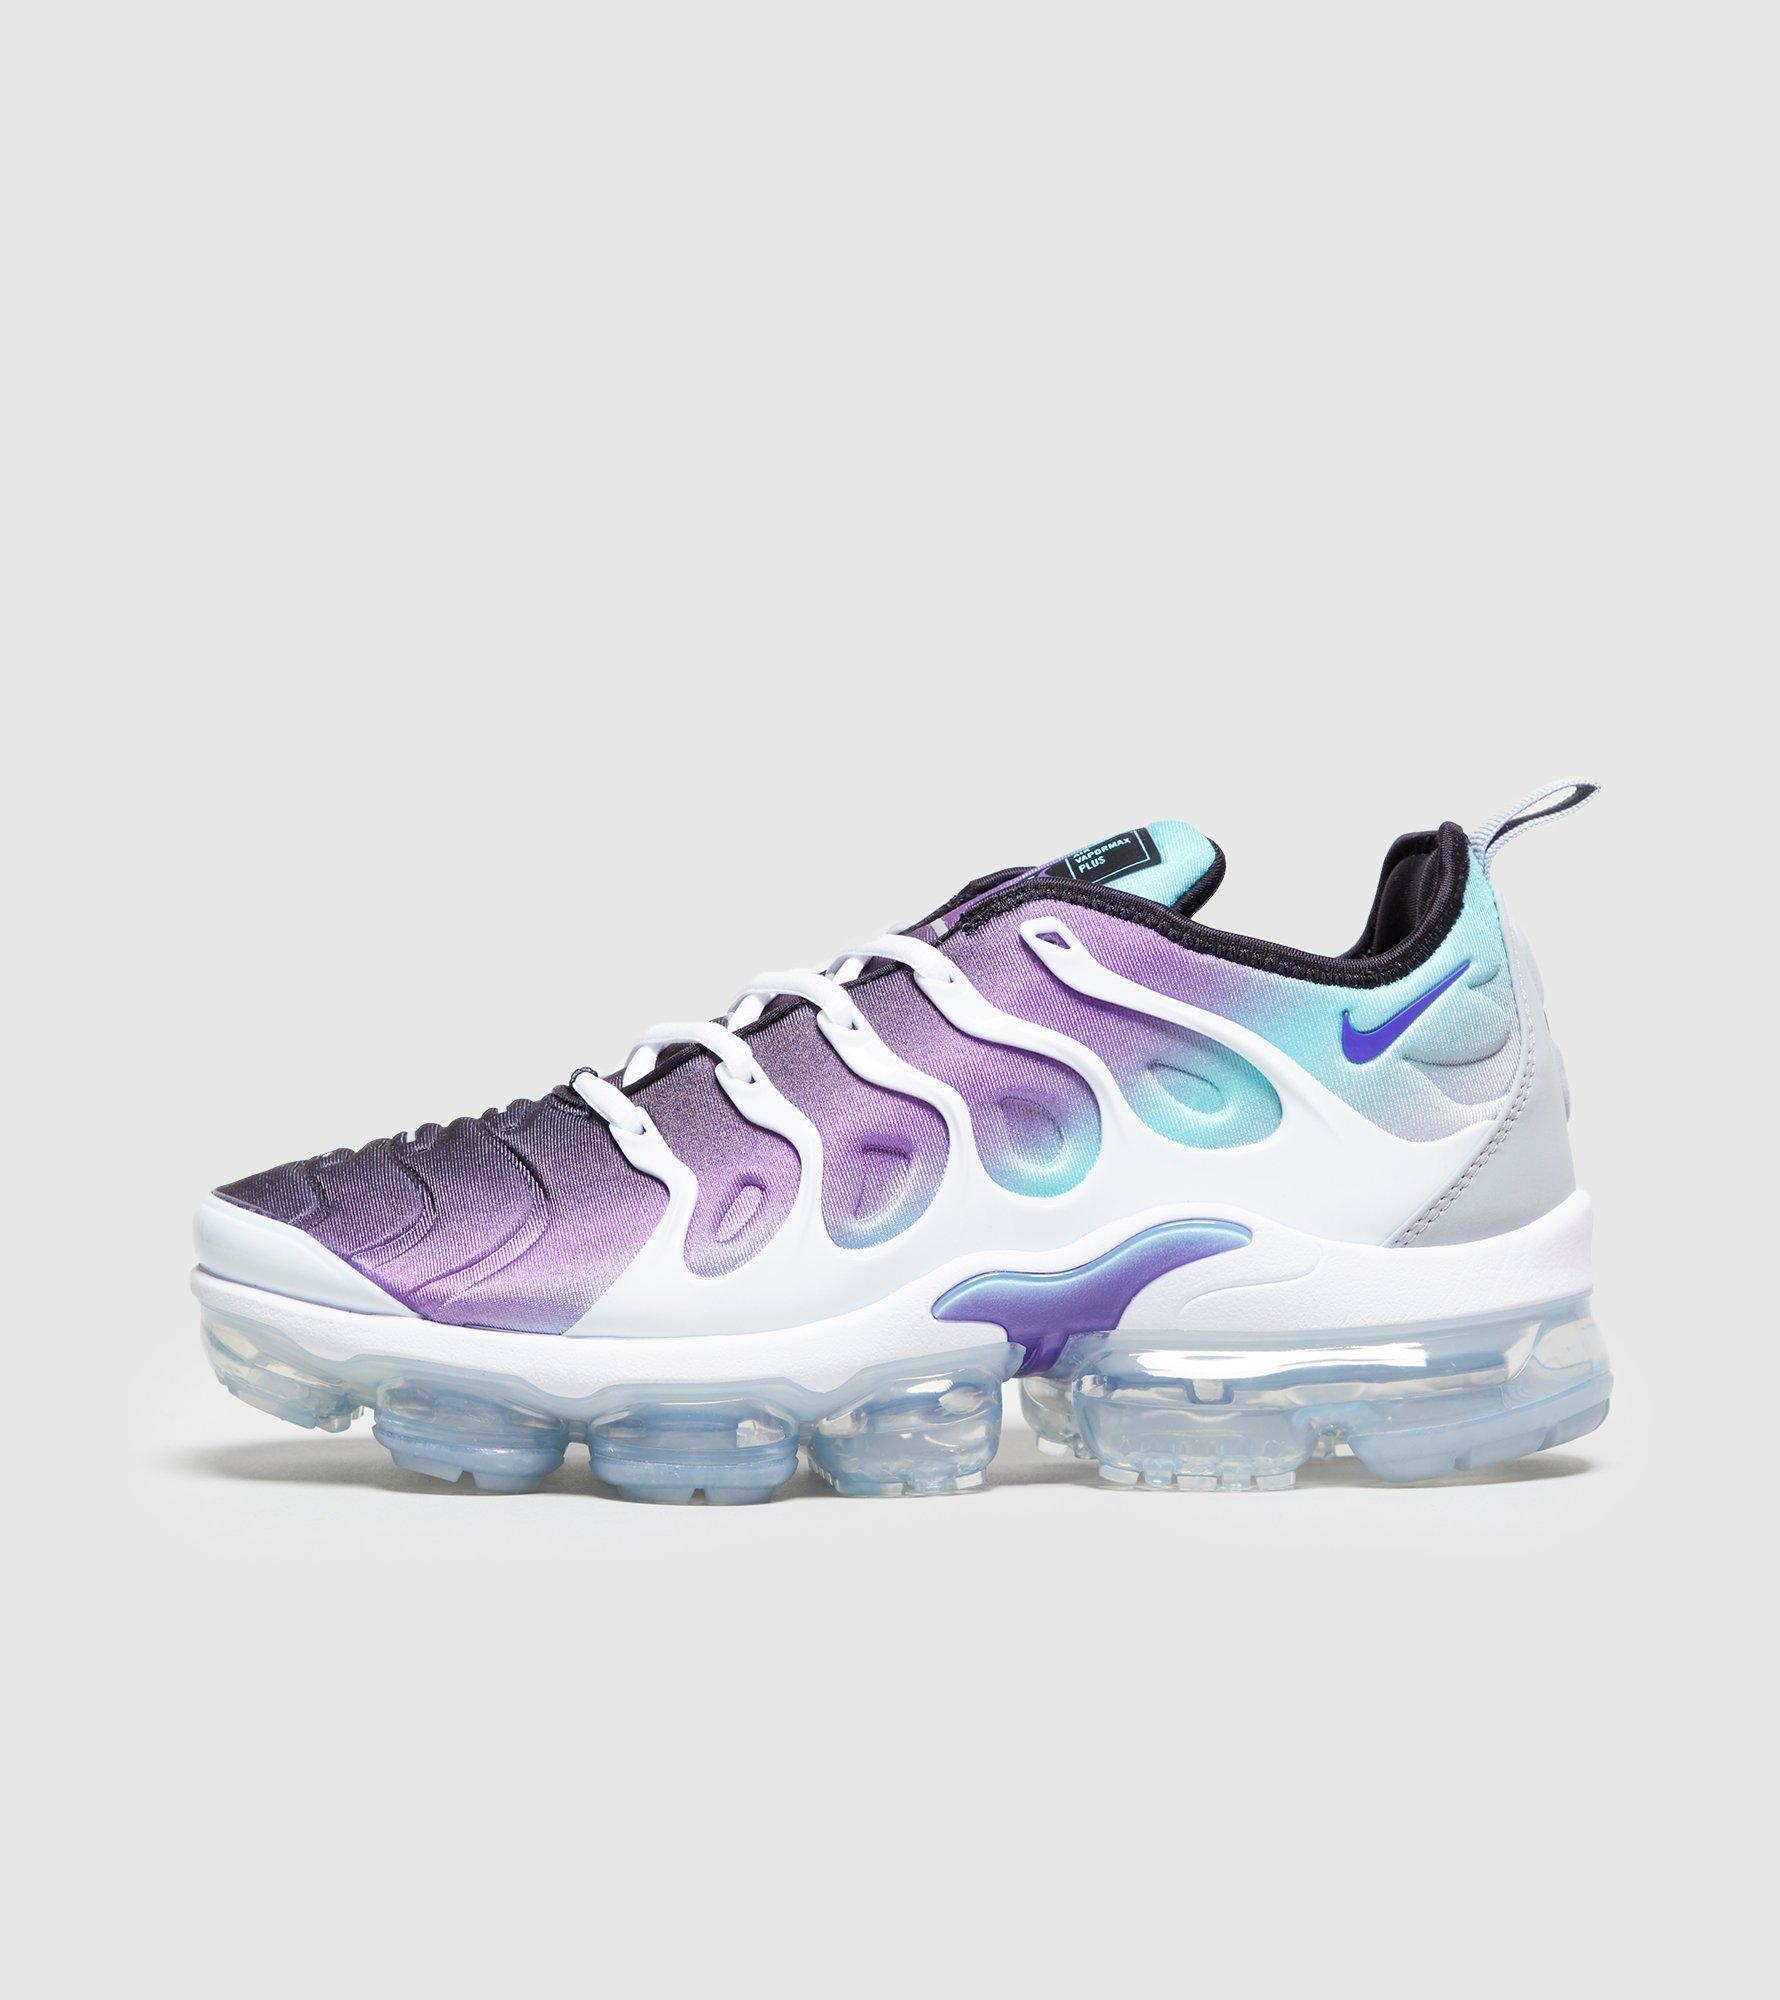 8aafa20558e9d ... new style lyst nike air vapormax plus in purple for men 4e5ed daf3e